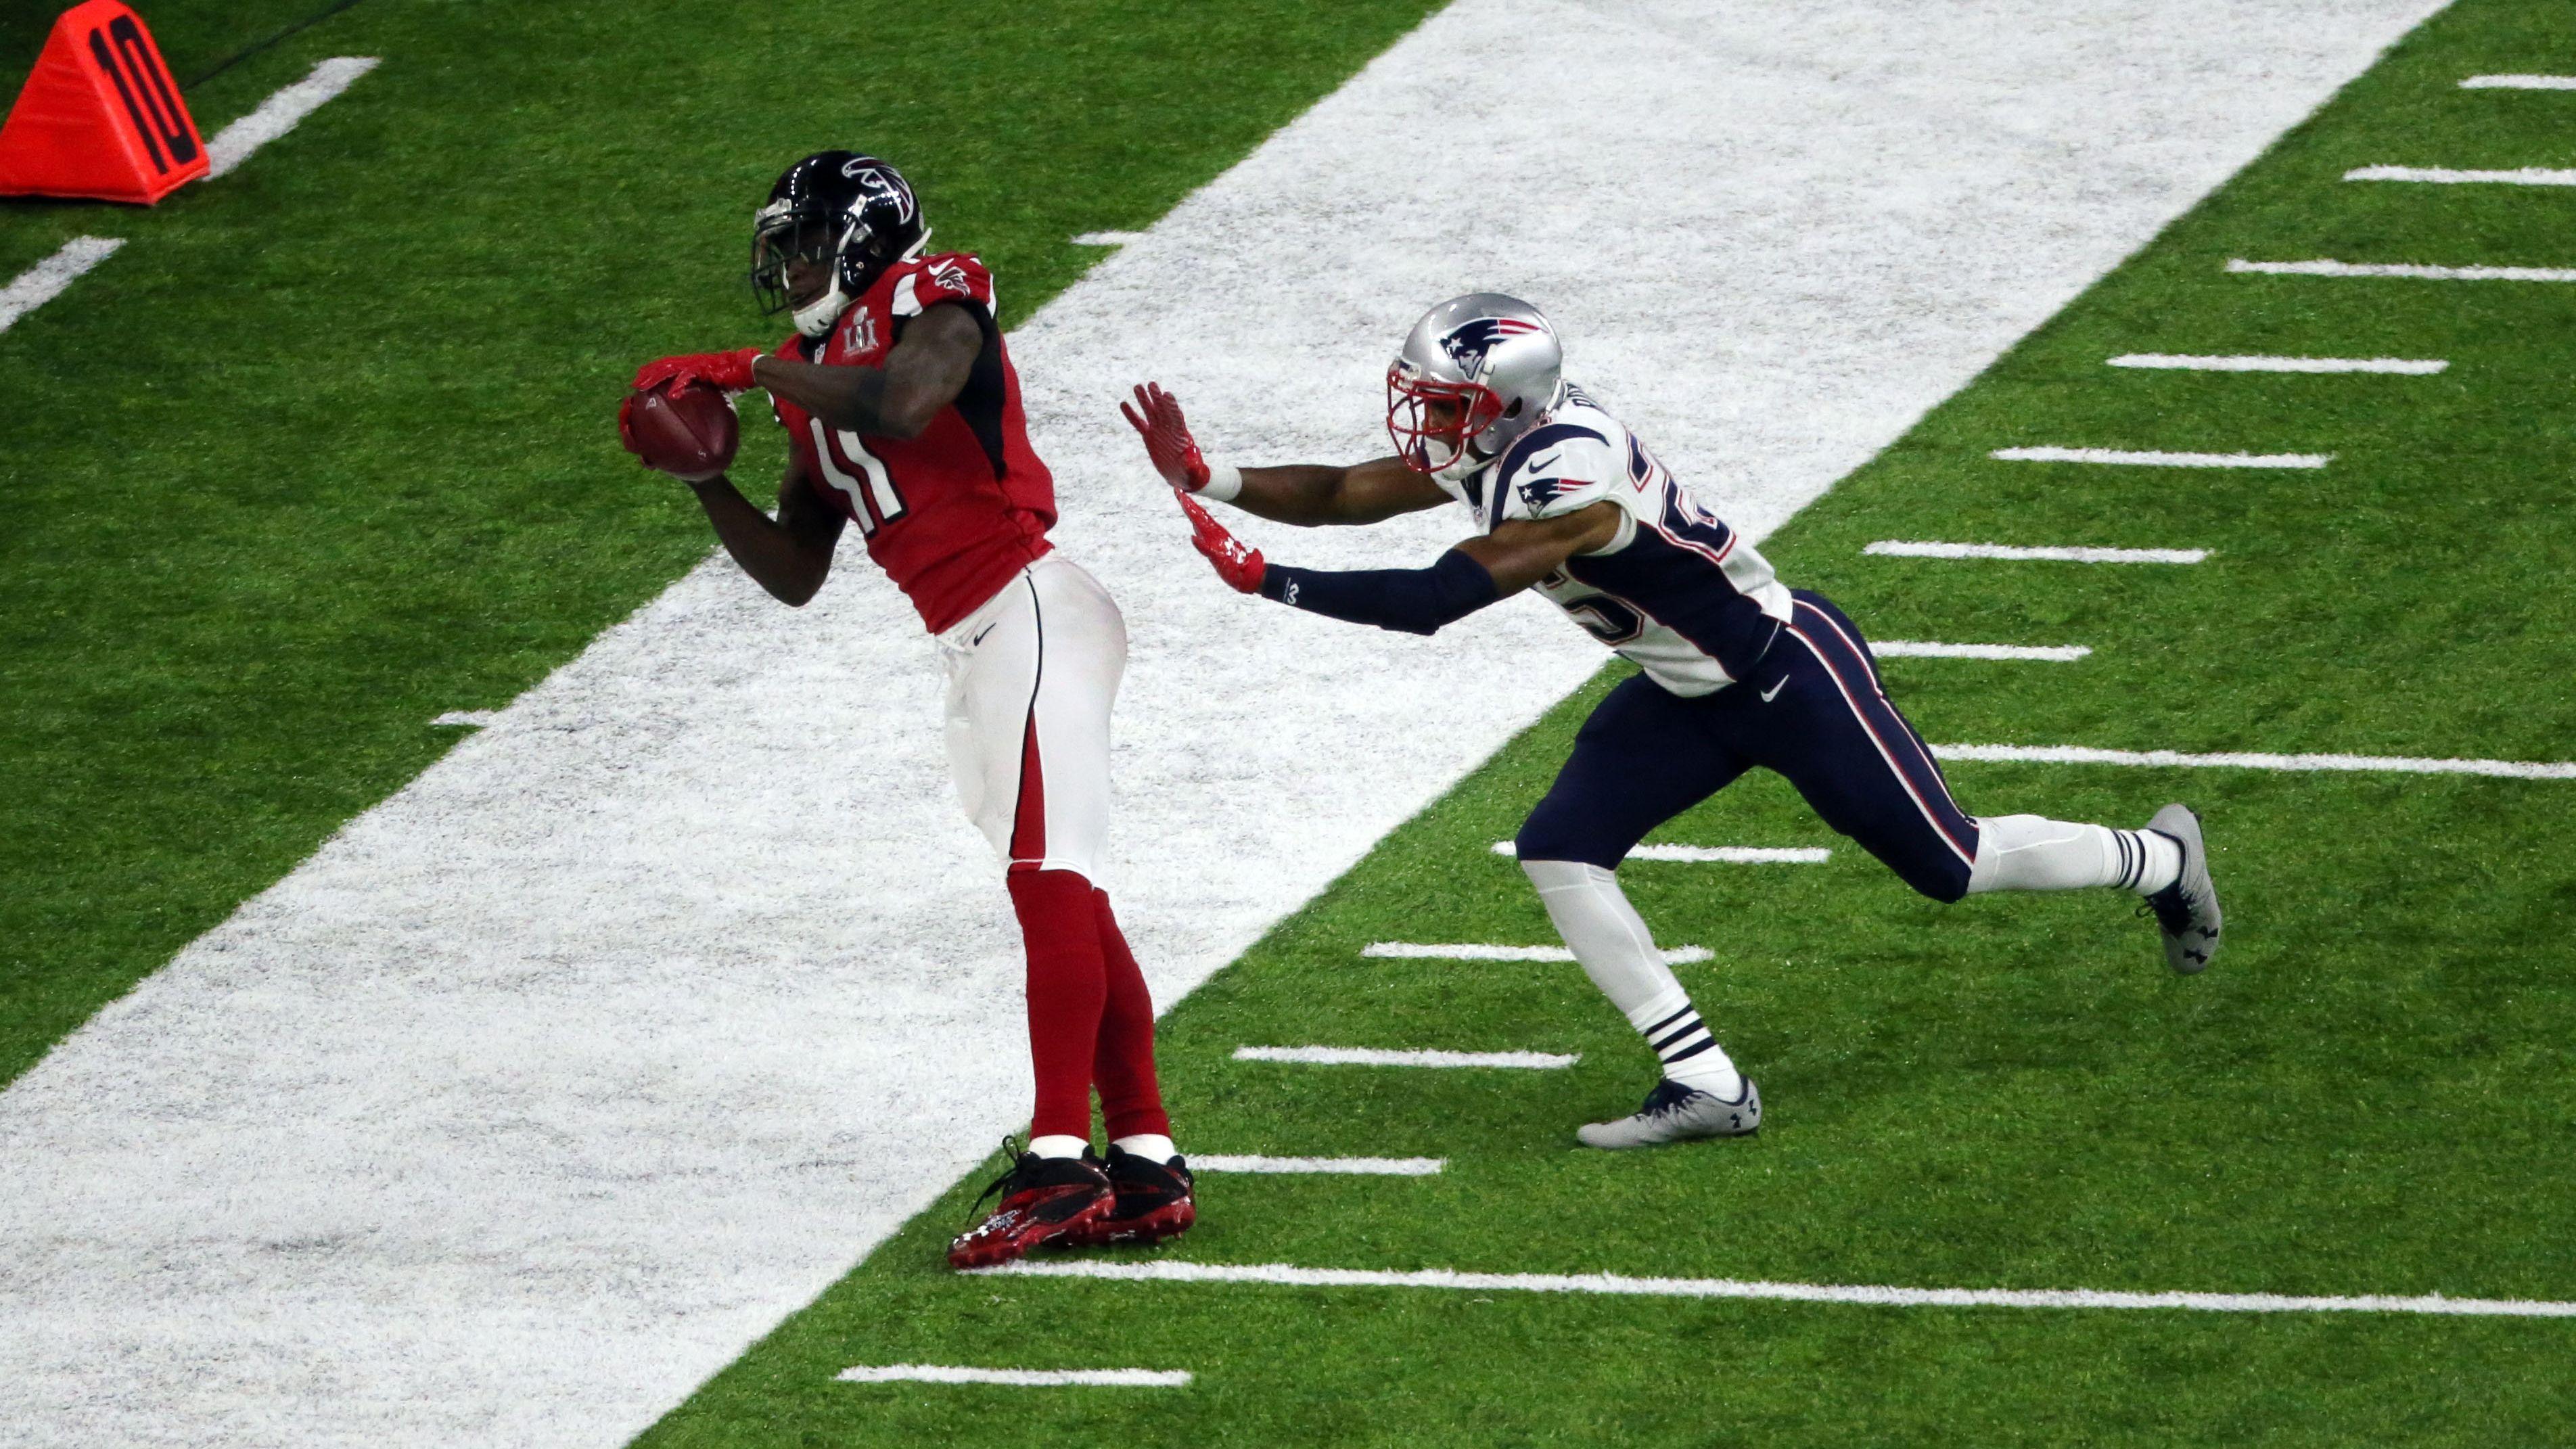 Julio Jones Super Bowl Catch Image Search Results In 2020 Julio Jones Super Bowl Image